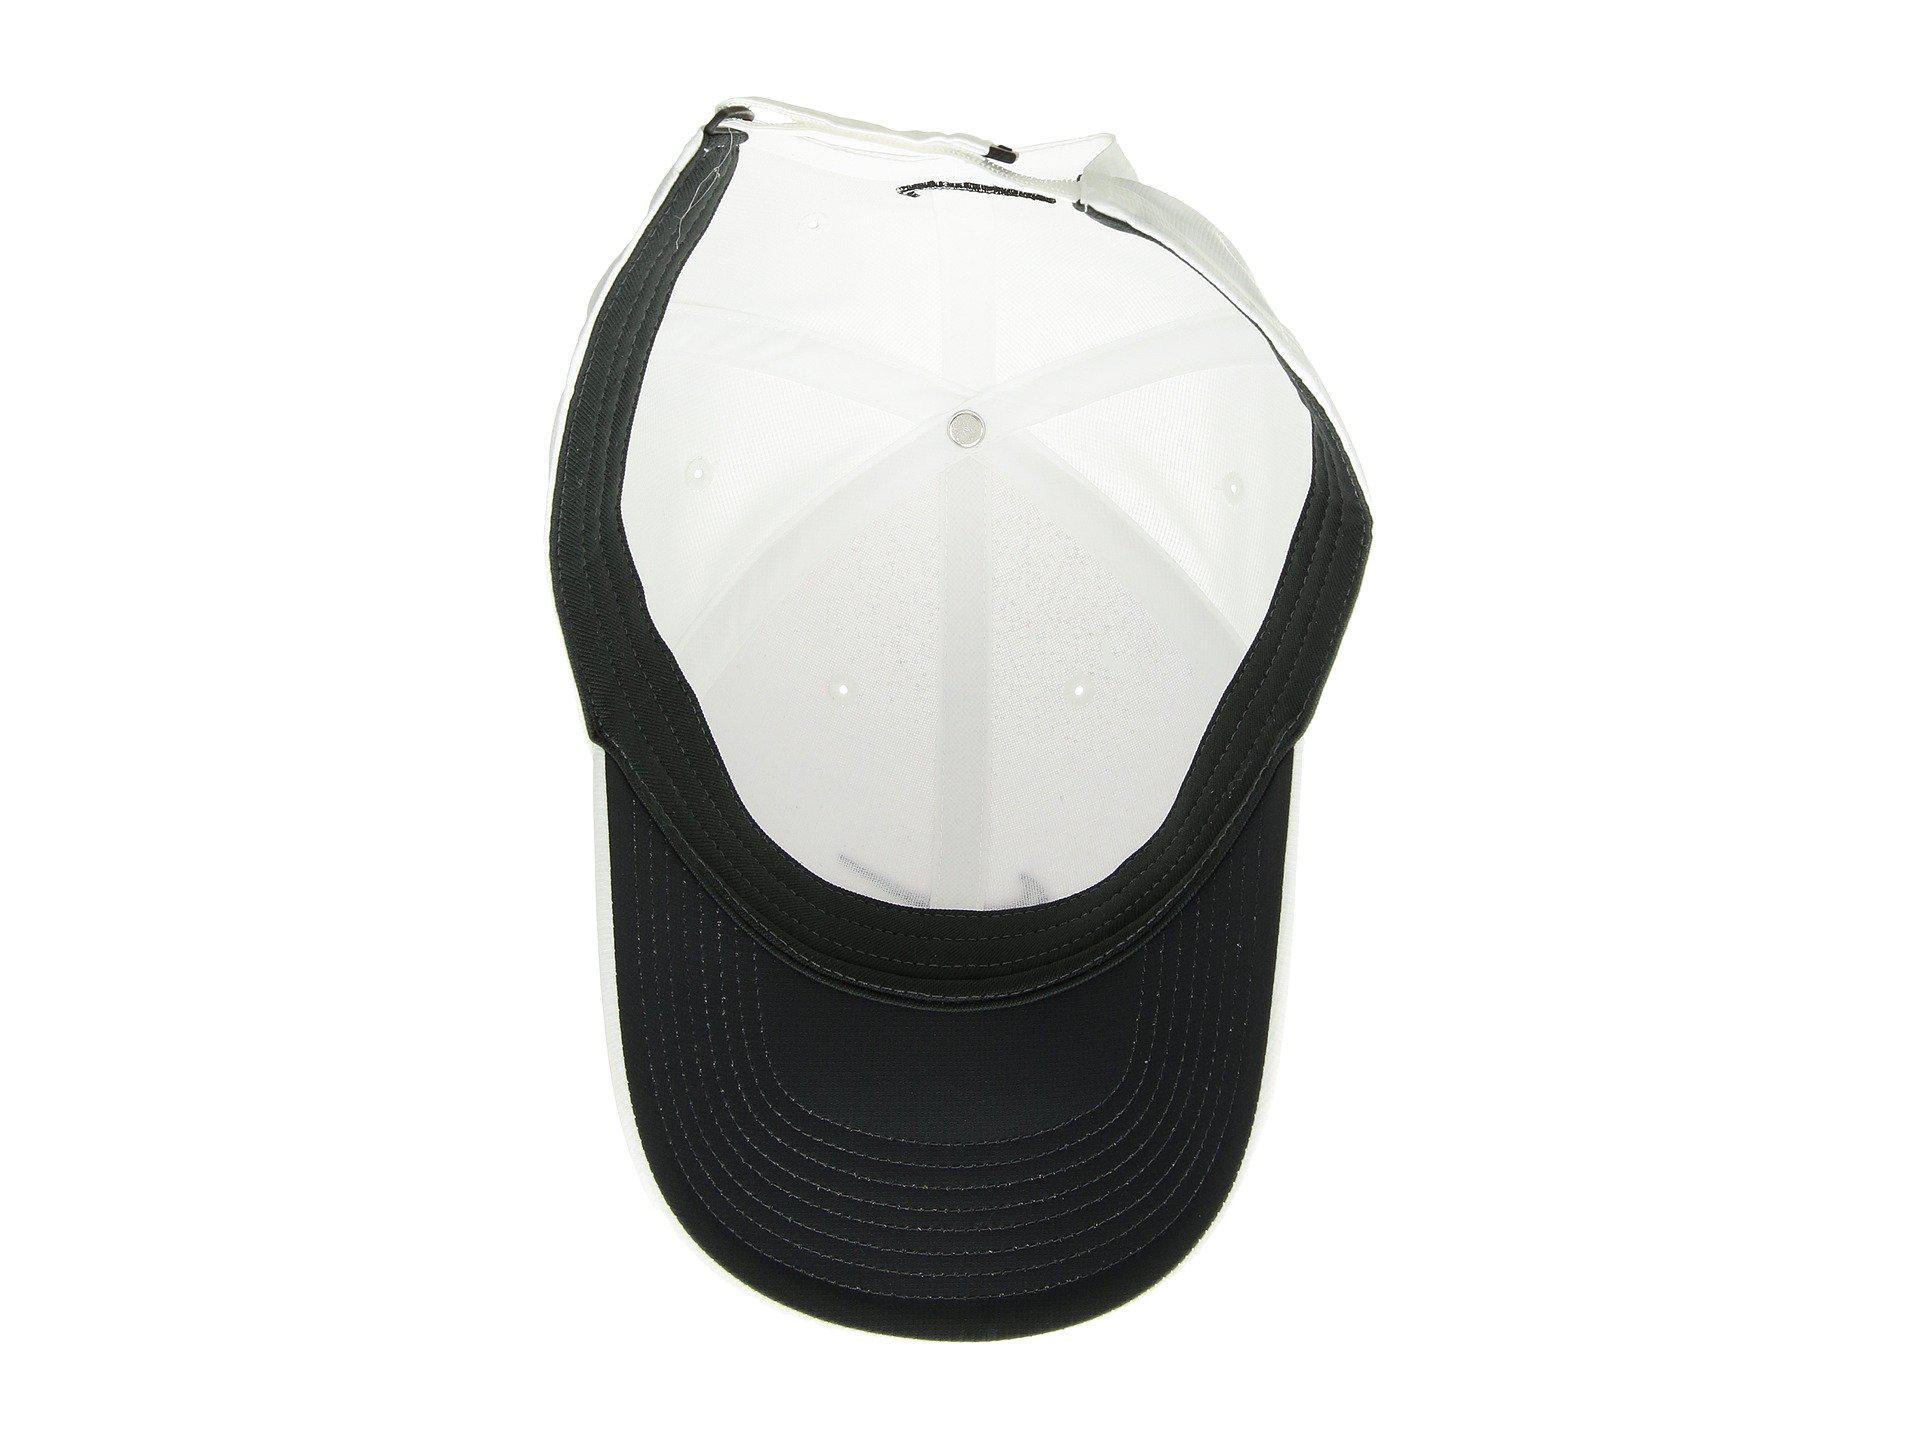 ce8dbd16294f2 Nike - Cap L91 Tech (black anthracite white) Caps for Men -. View fullscreen